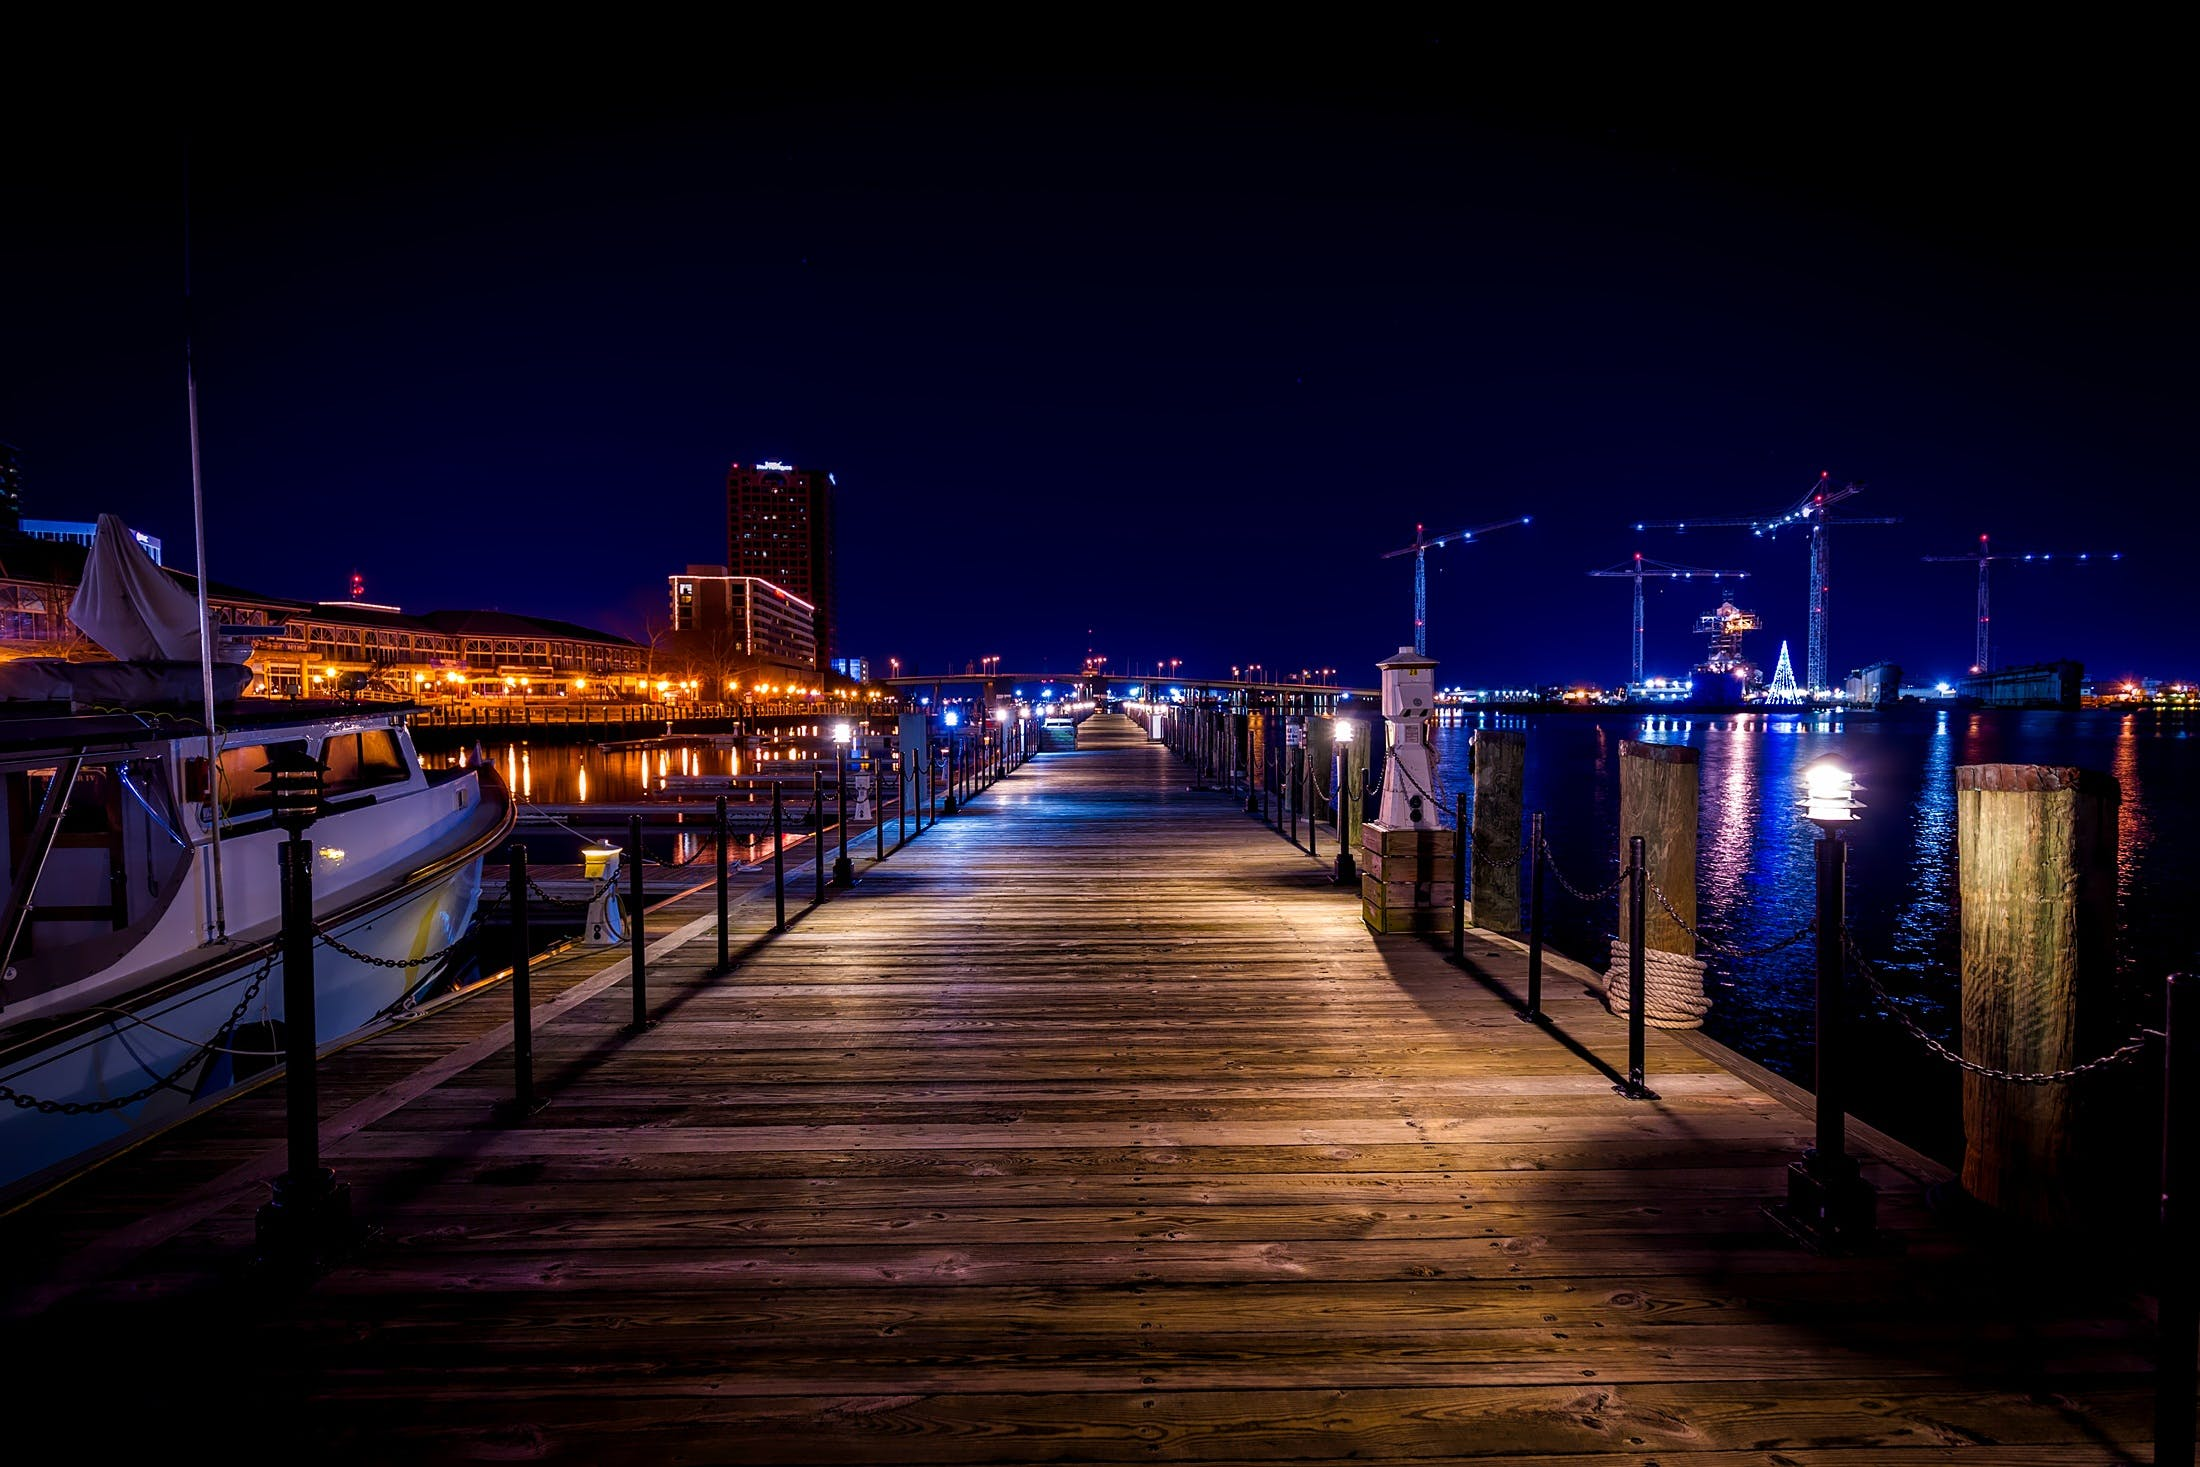 Kostenloses Stock Foto zu meer, stadt, beleuchtung, nacht